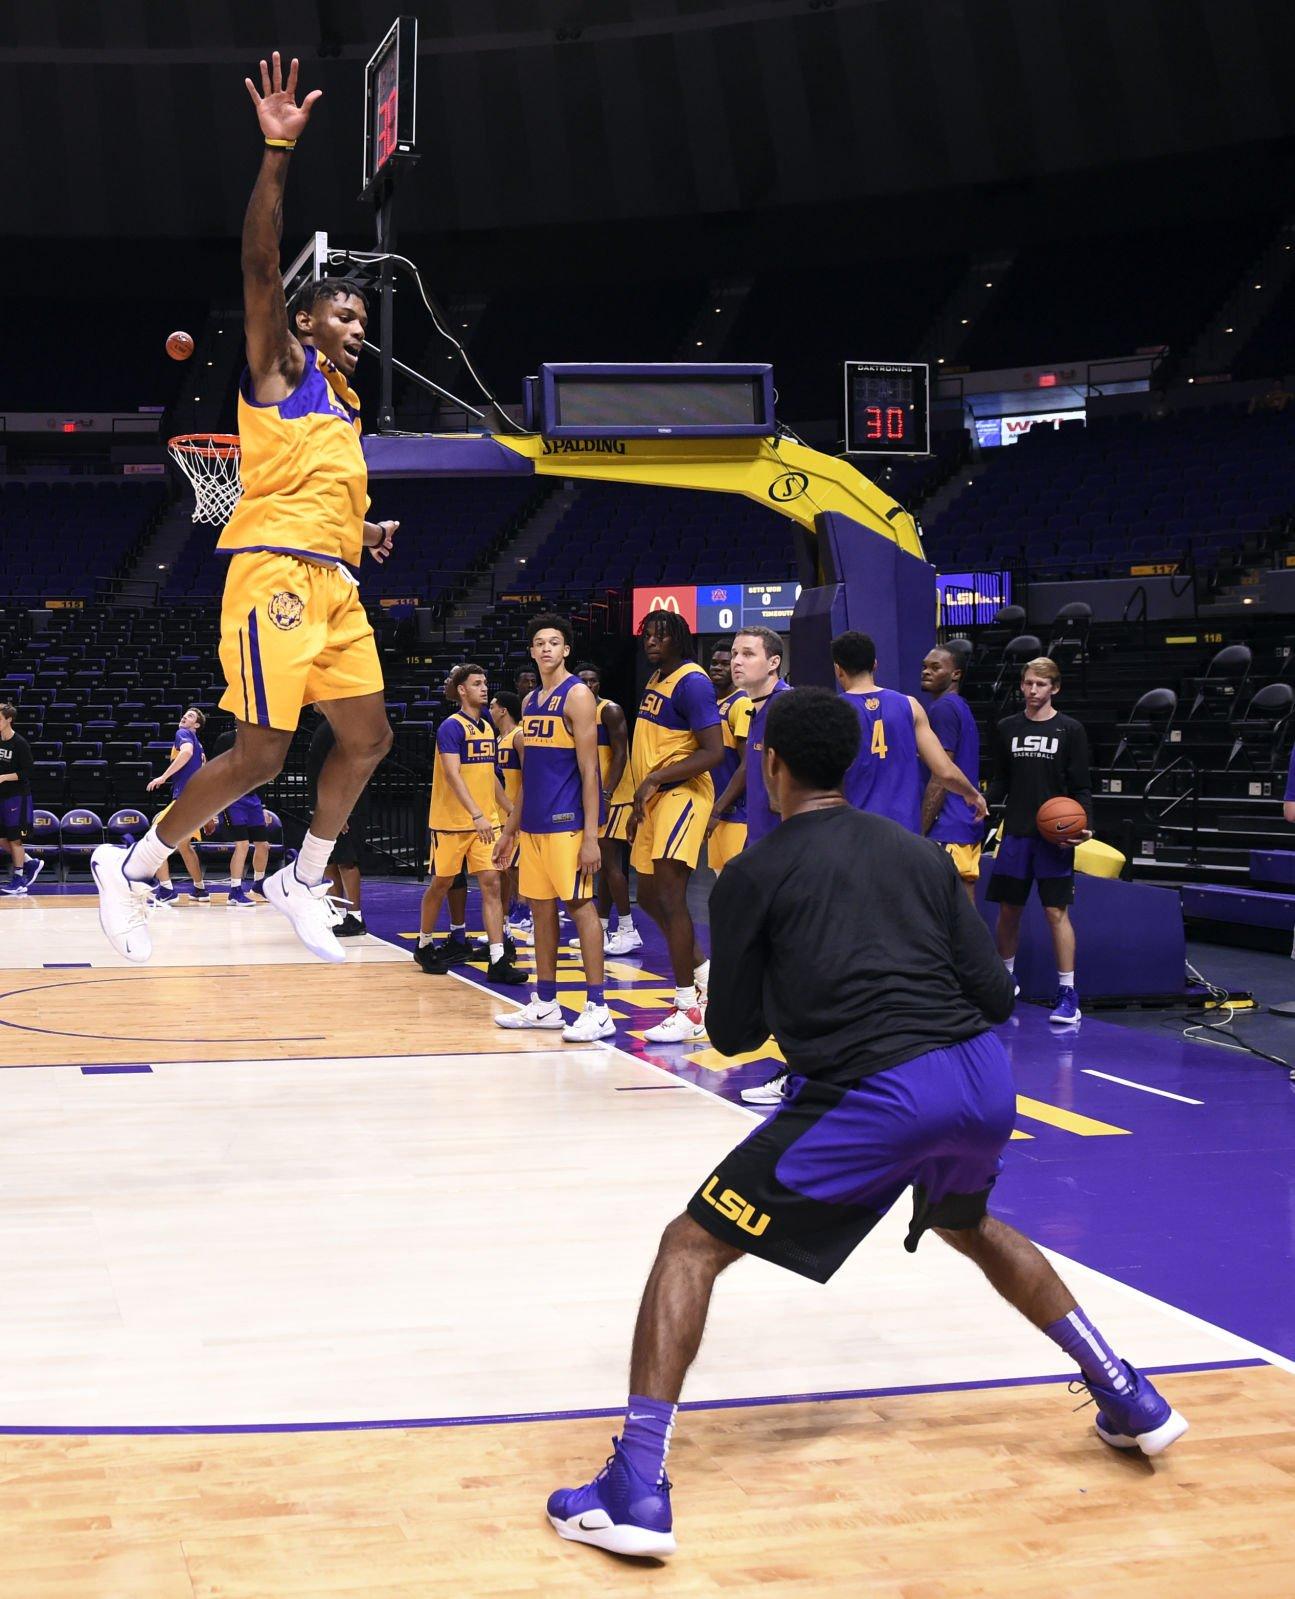 Photos: LSU basketball shows off star